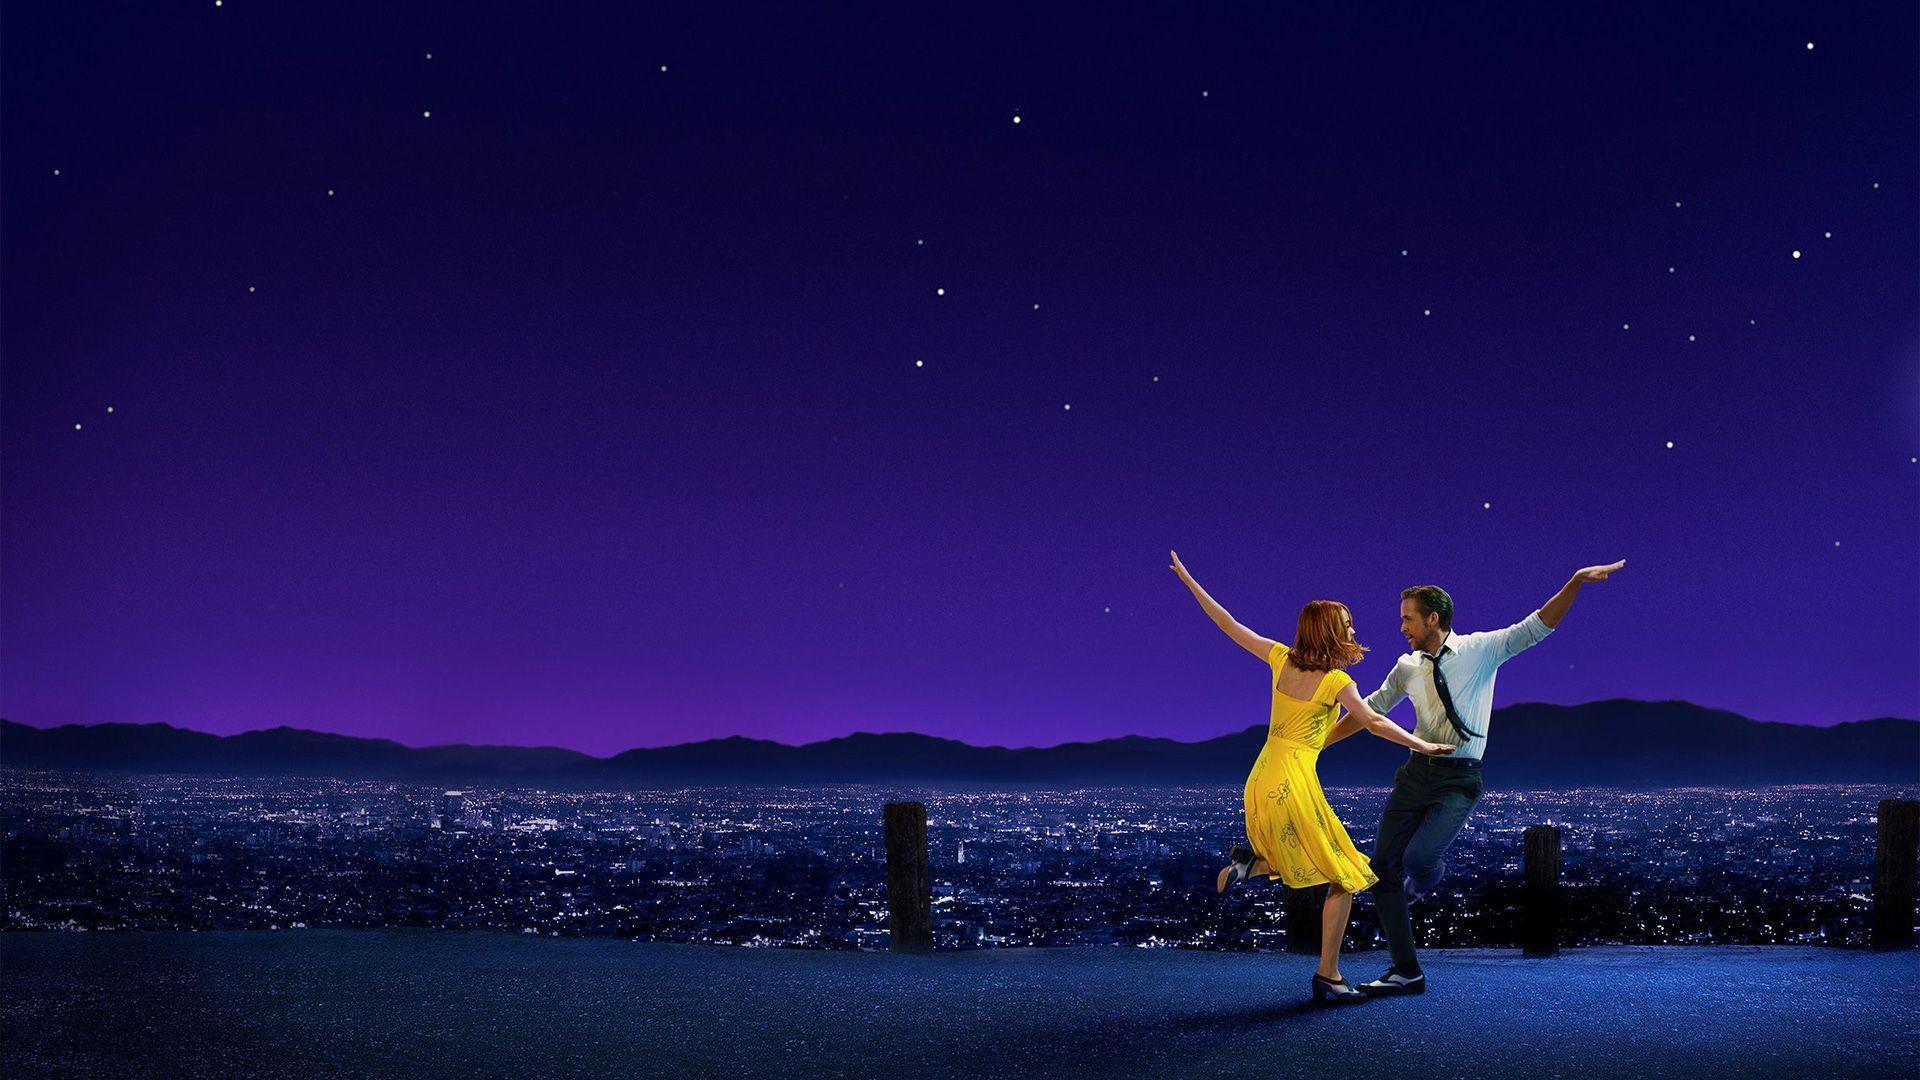 La La Land Wallpapers Top Free La La Land Backgrounds